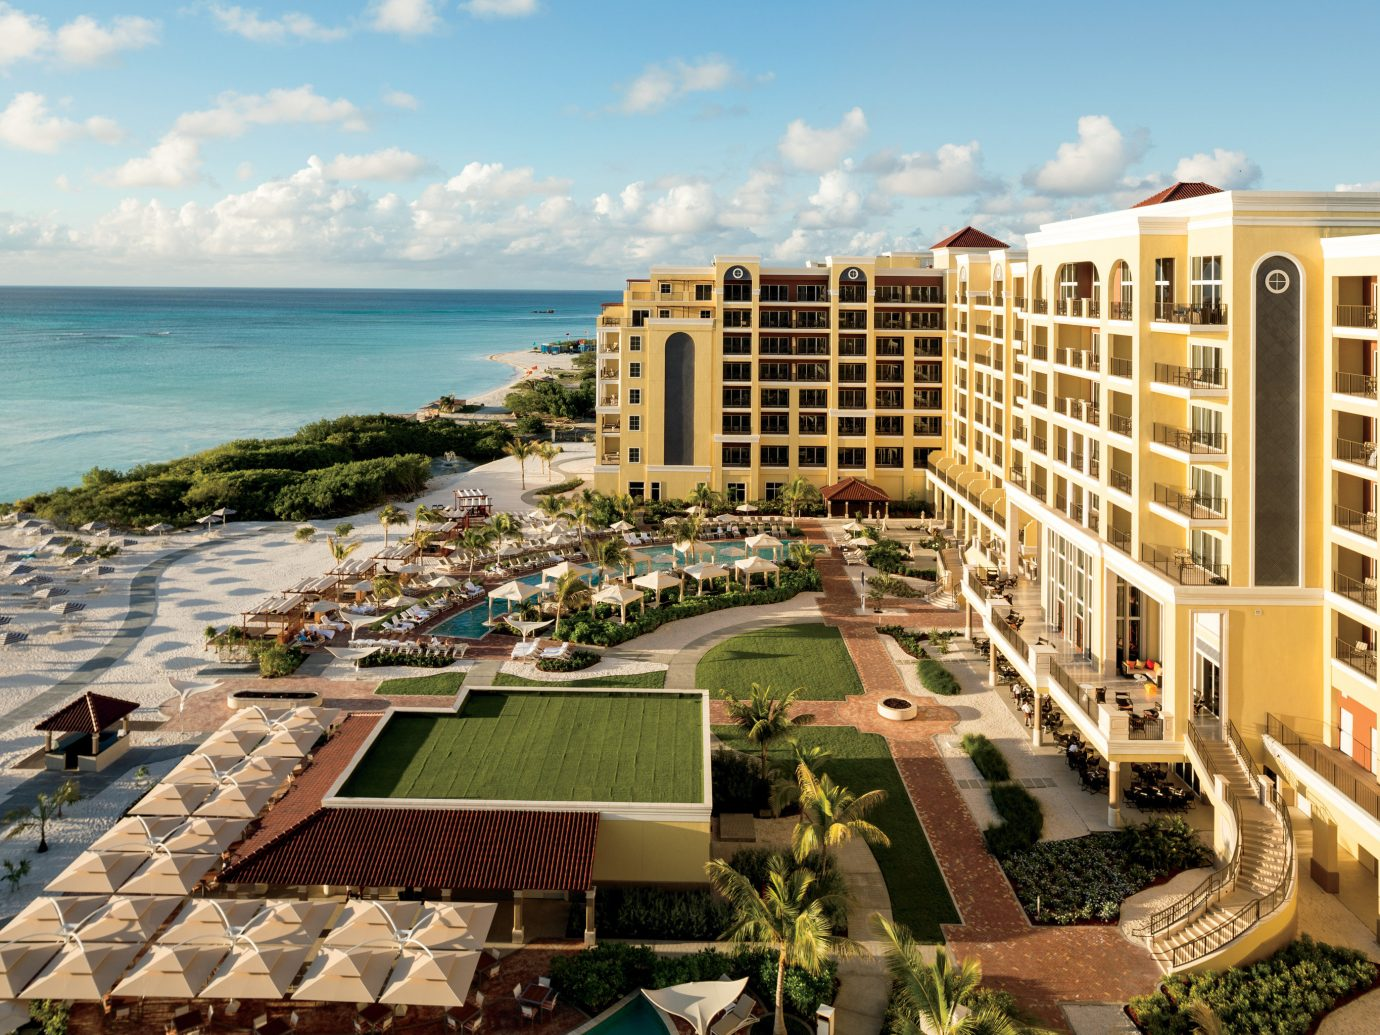 Aruba caribbean Hotels outdoor sky condominium property Resort mixed use real estate residential area hotel apartment vacation estate building City lawn shore sandy